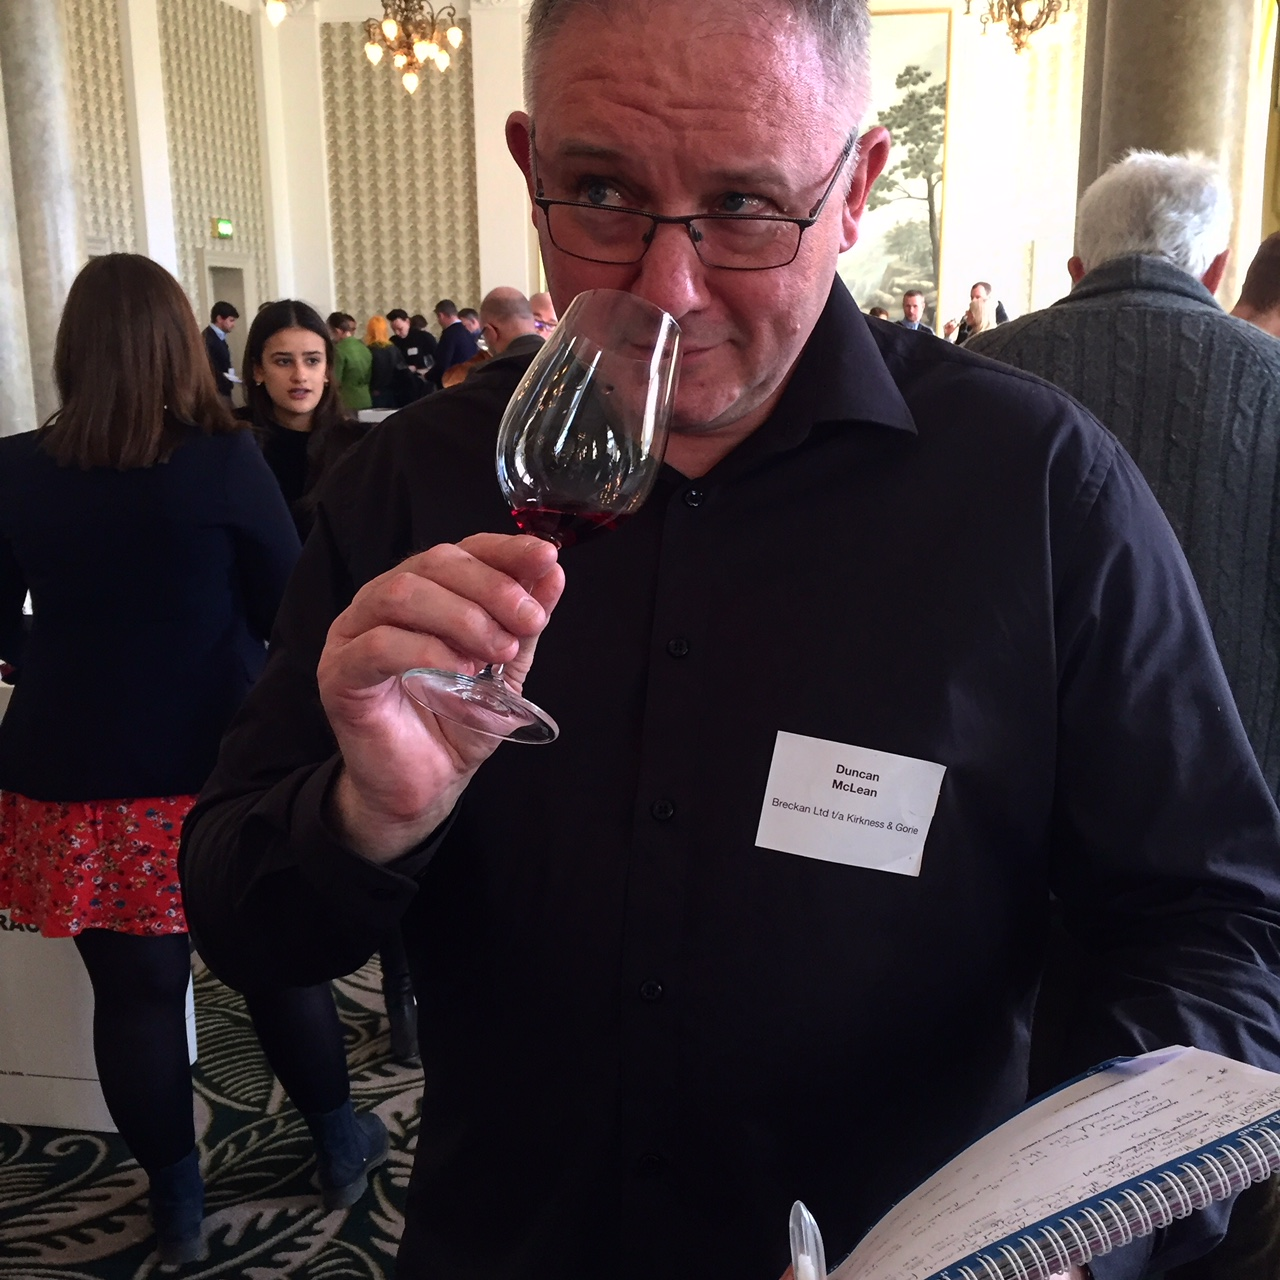 Duncan wine tasting.jpg